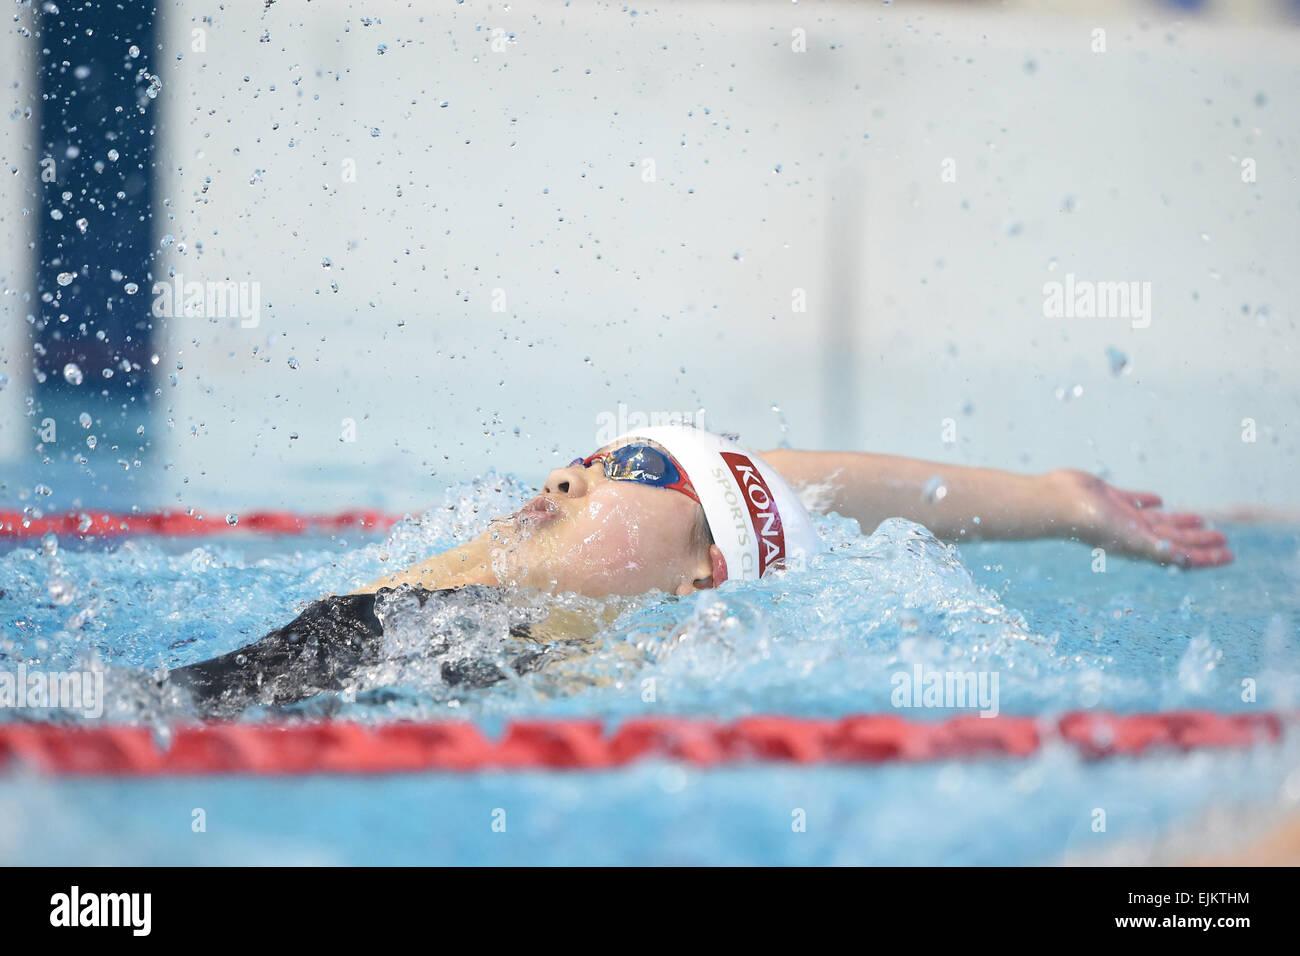 tatsumi international swimming pool tokyo japan 28th mar 2015 nagisa izuhara march 28 2015 swimming the 37th joc junior olympic cup womens 50m